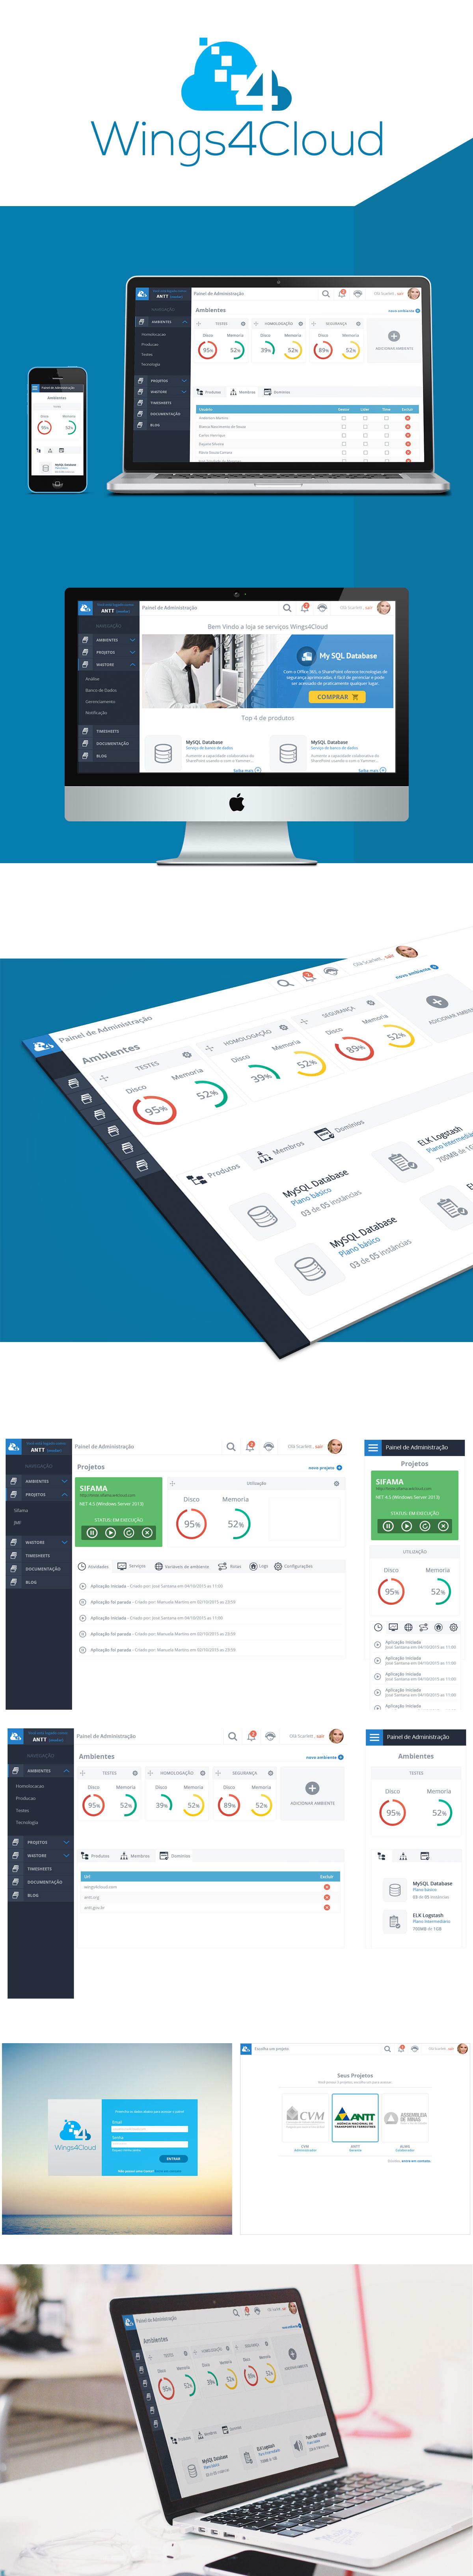 dashboard mobile app Web service cloud designer ux UI